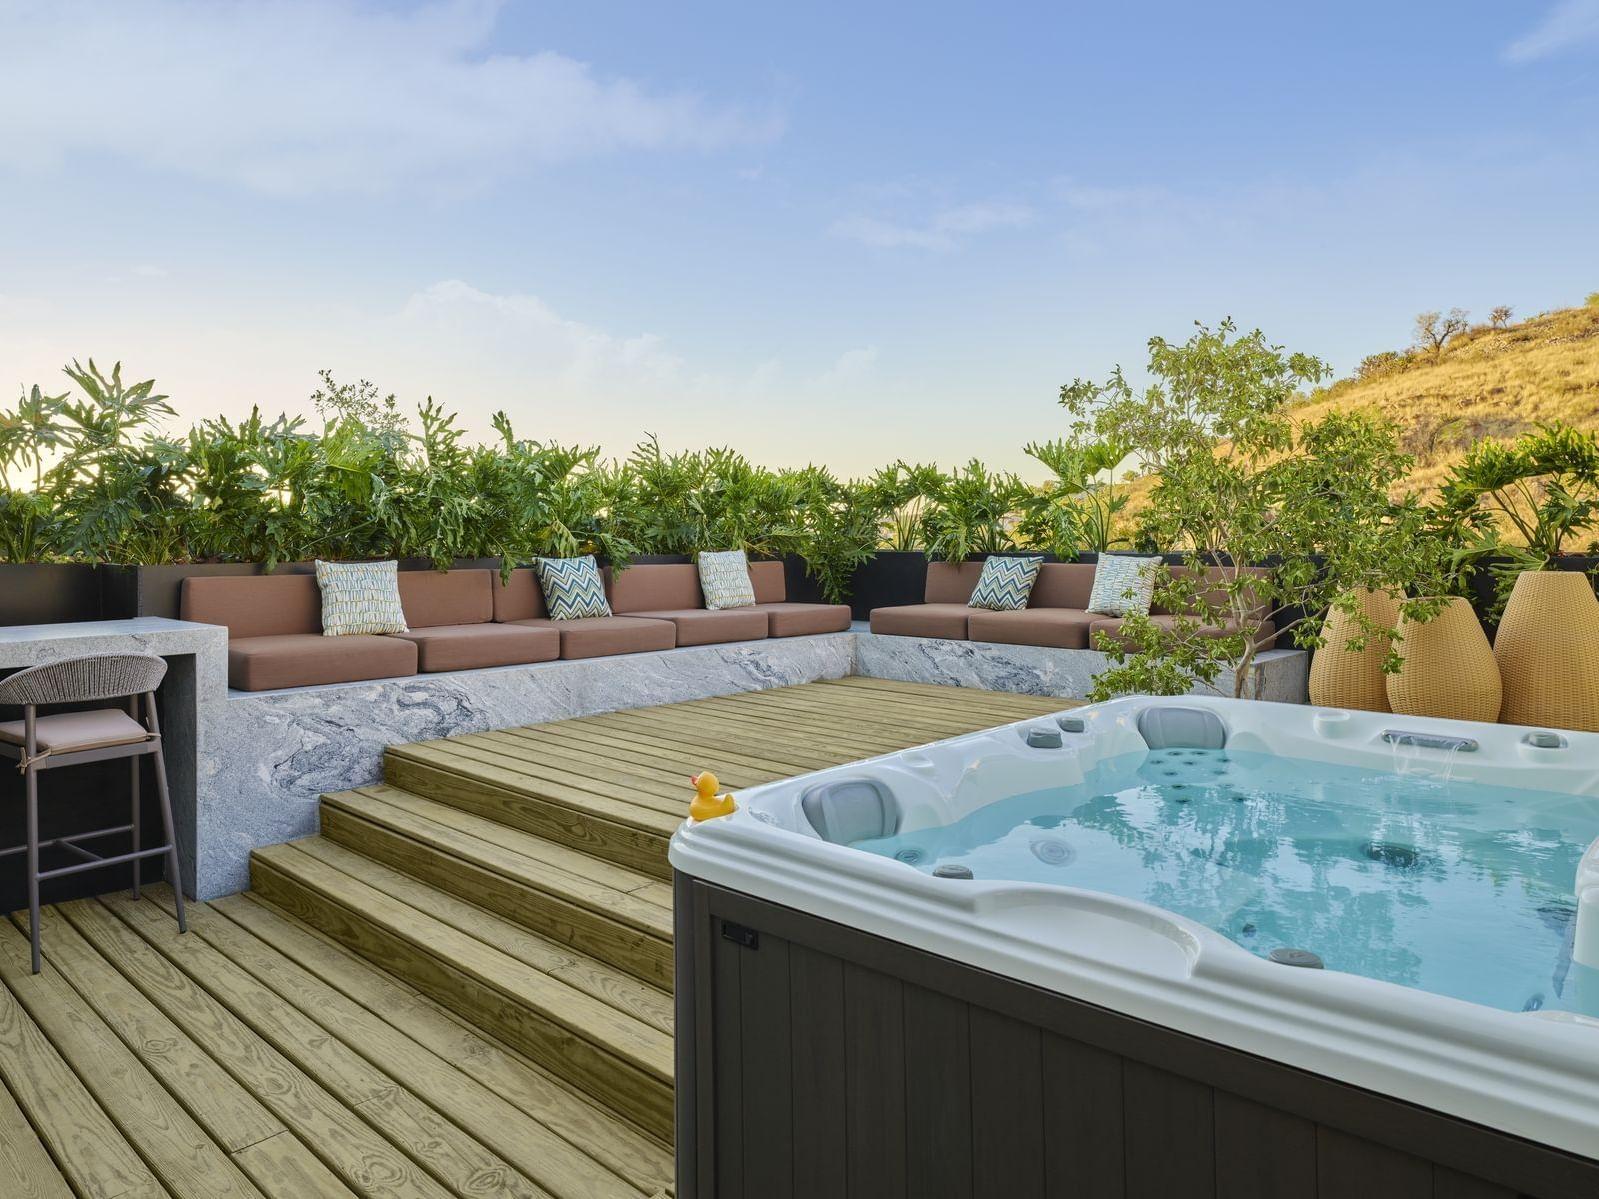 Aqua suite terrace with jacuzzi at the La Coleccion Resorts